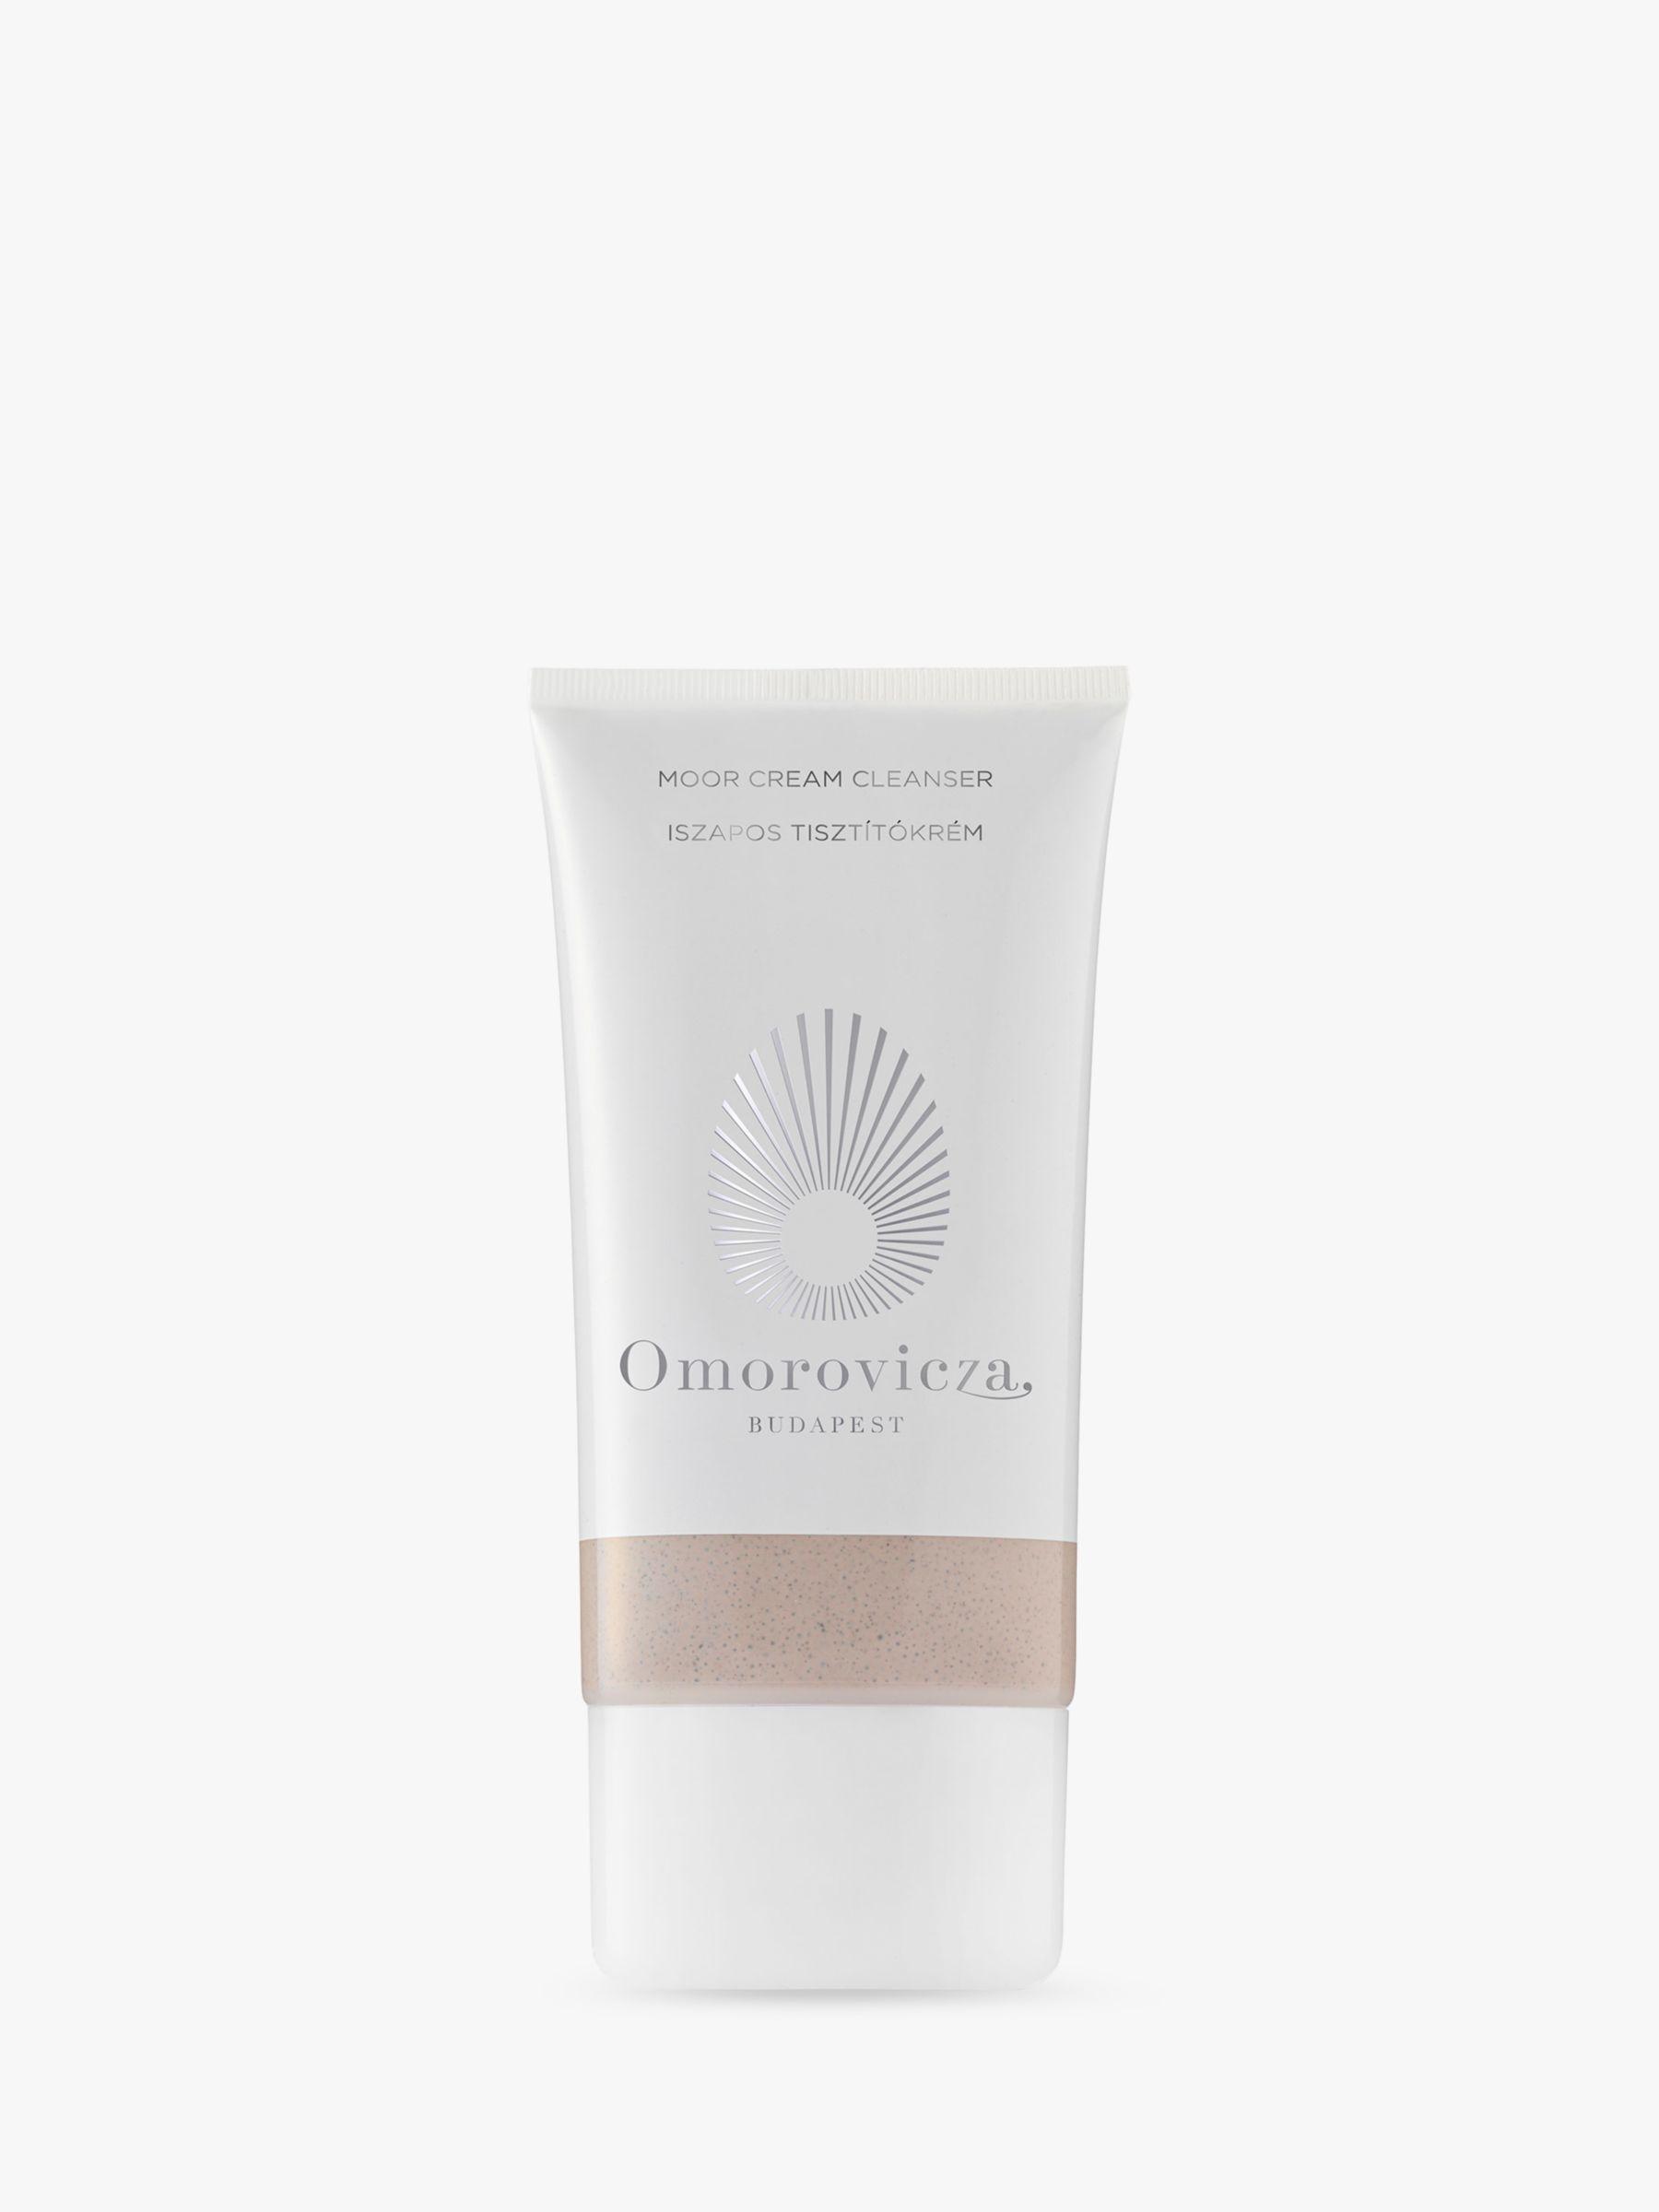 Omorovicza Omorovicza Moor Cream Cleanser, 150ml